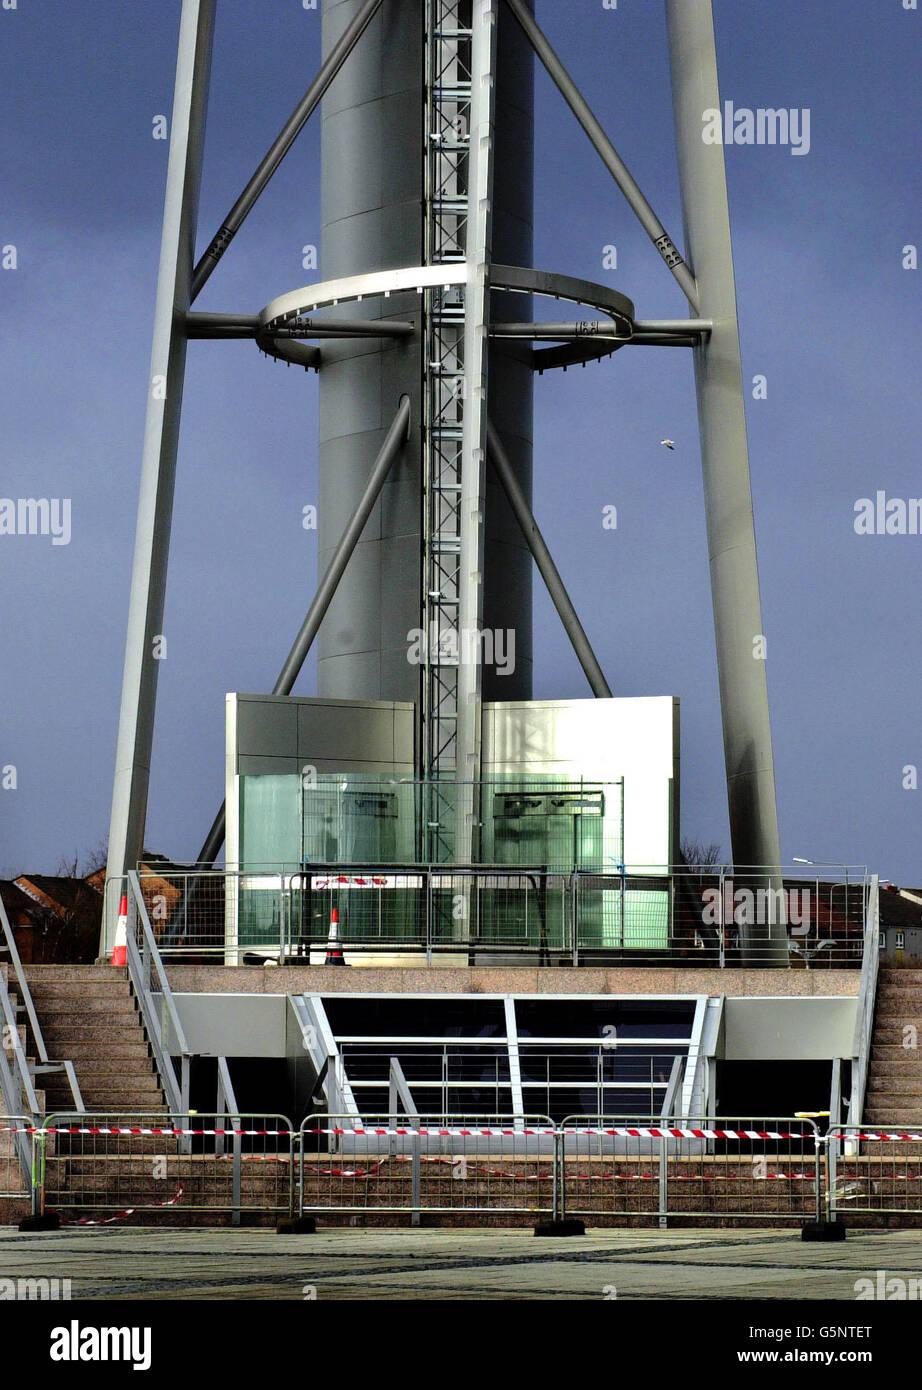 Glasgow Tower shut down - Stock Image